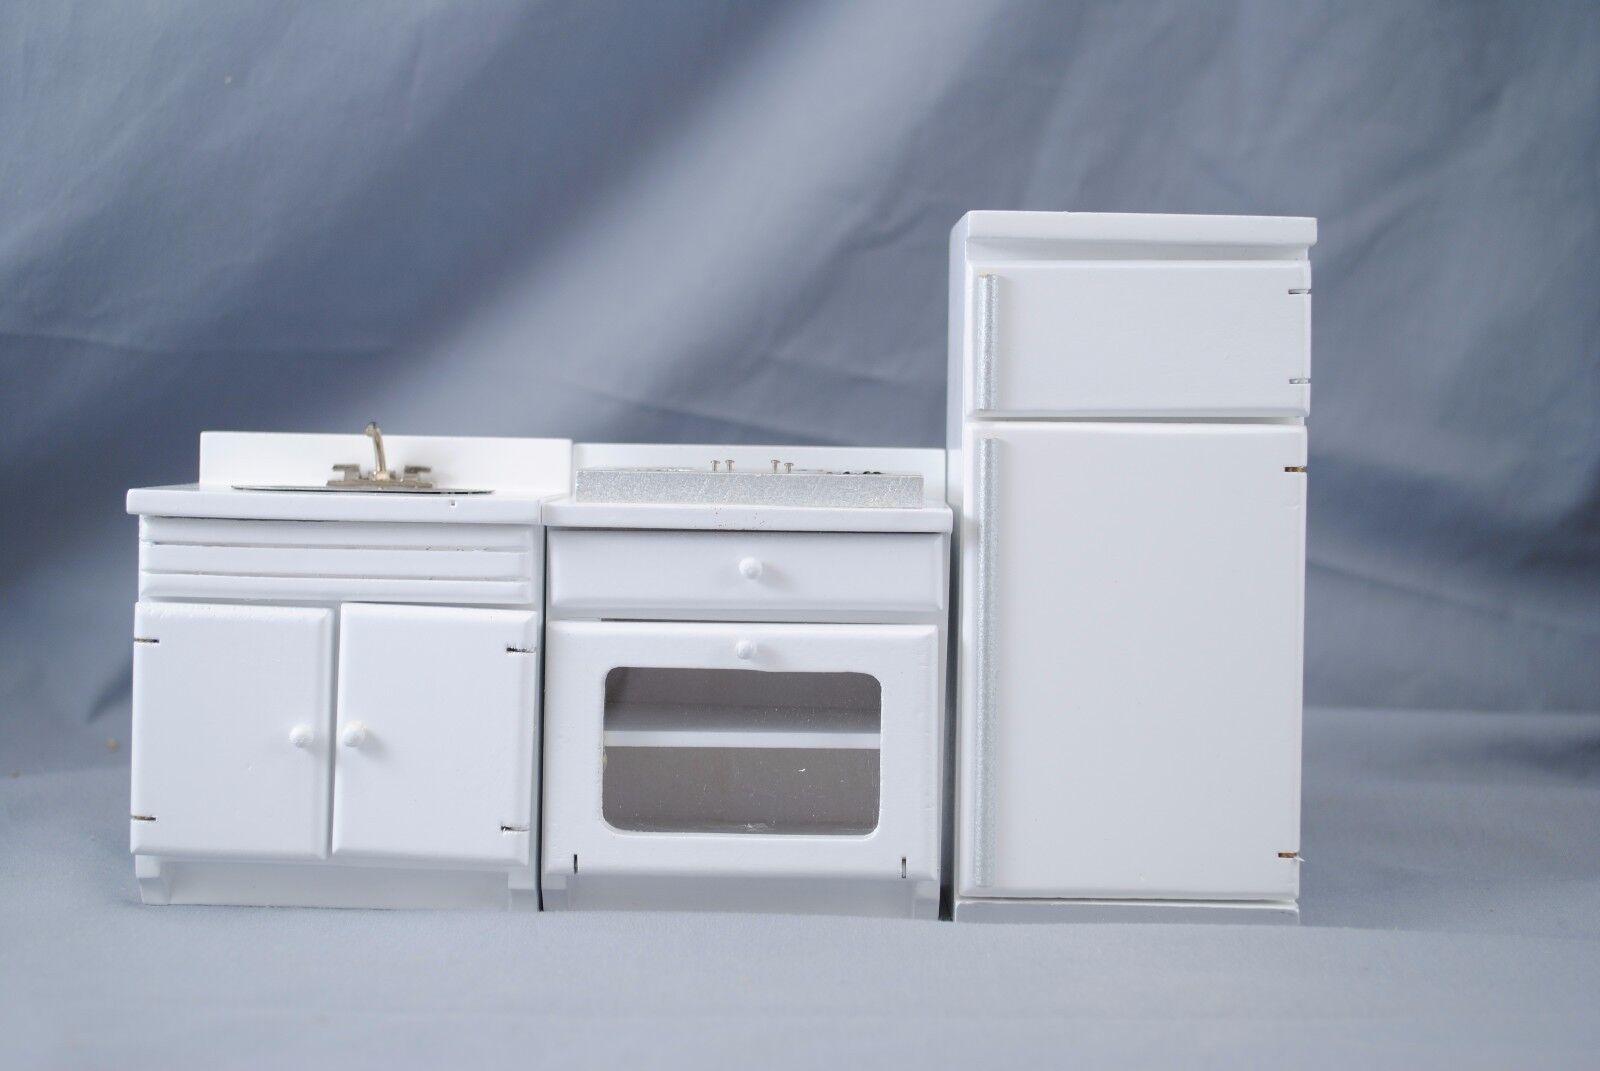 Küche Set Weiß T6489 Puppenhaus Miniatur 3pc 1 12 Maßstab Holzmöbel  | Flagship-Store